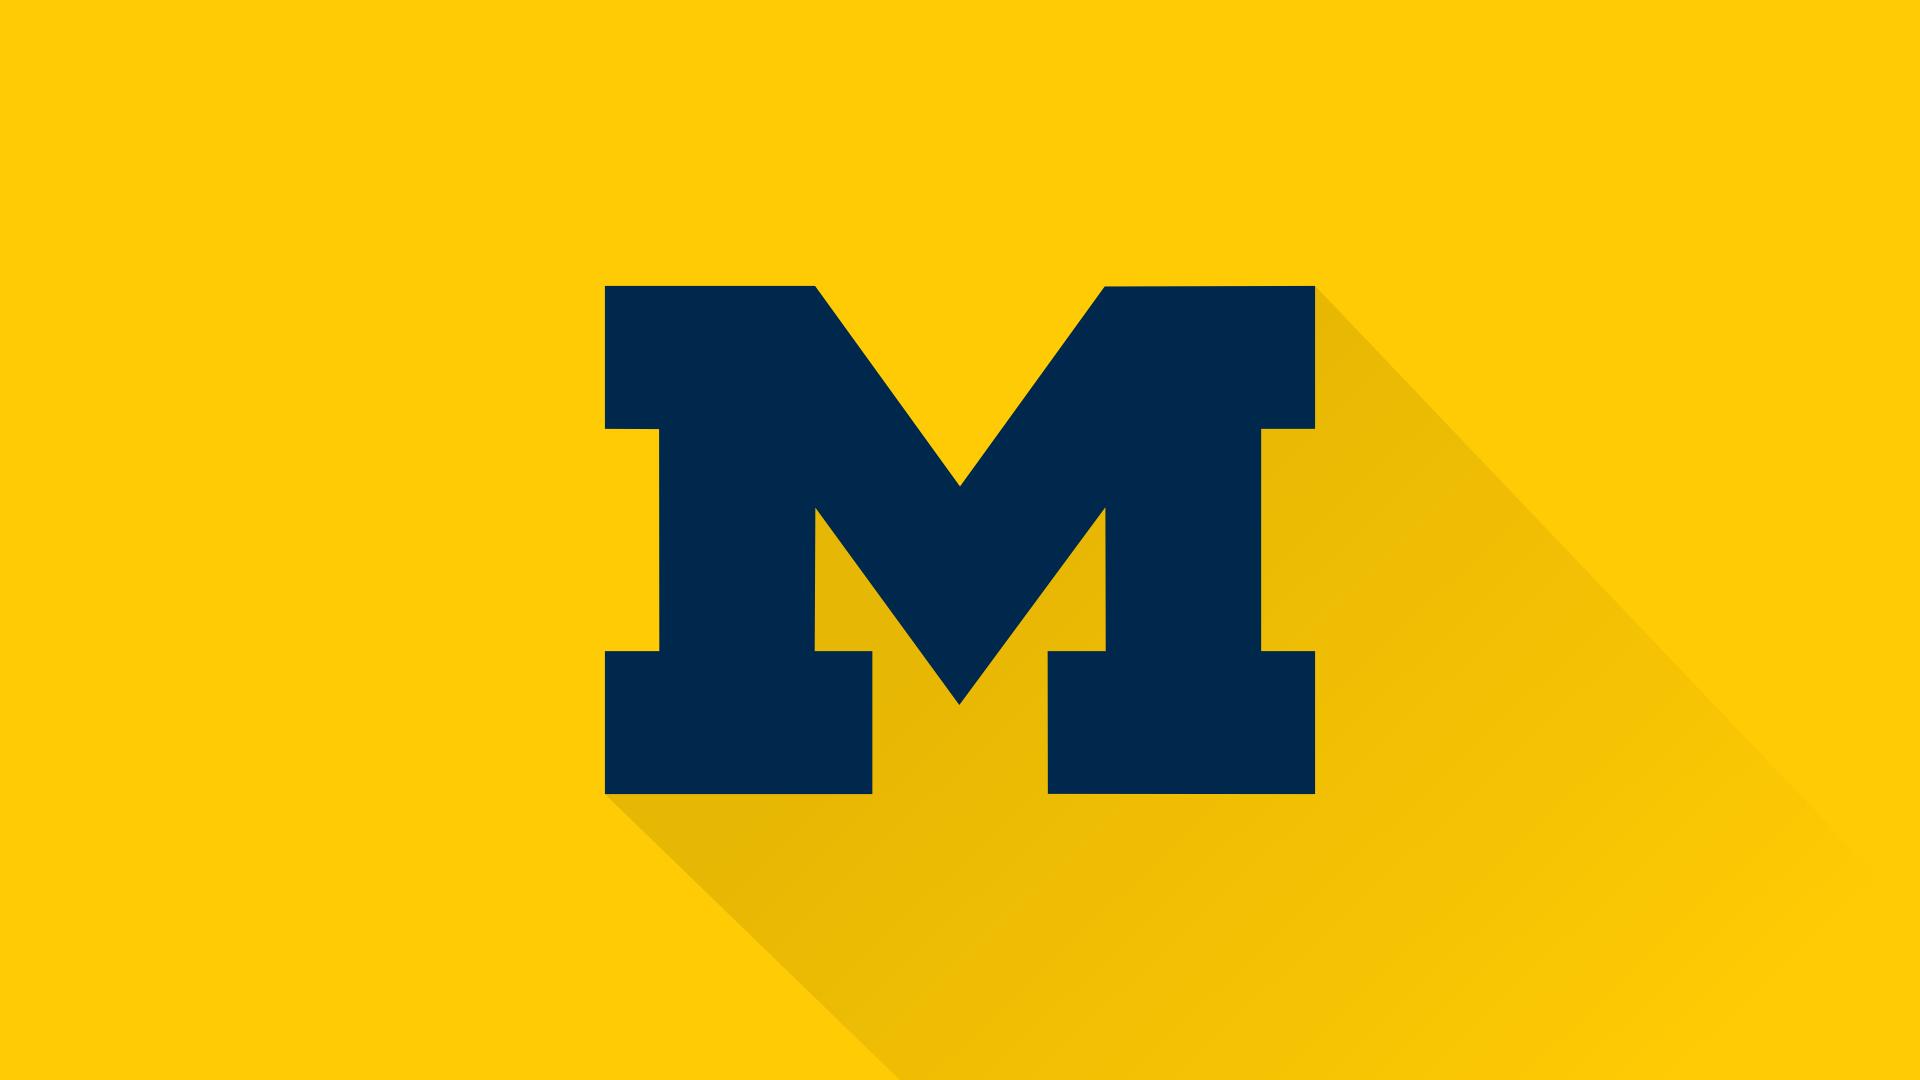 University Of Michigan Wallpapers   Wallpaper Zone 1920x1080